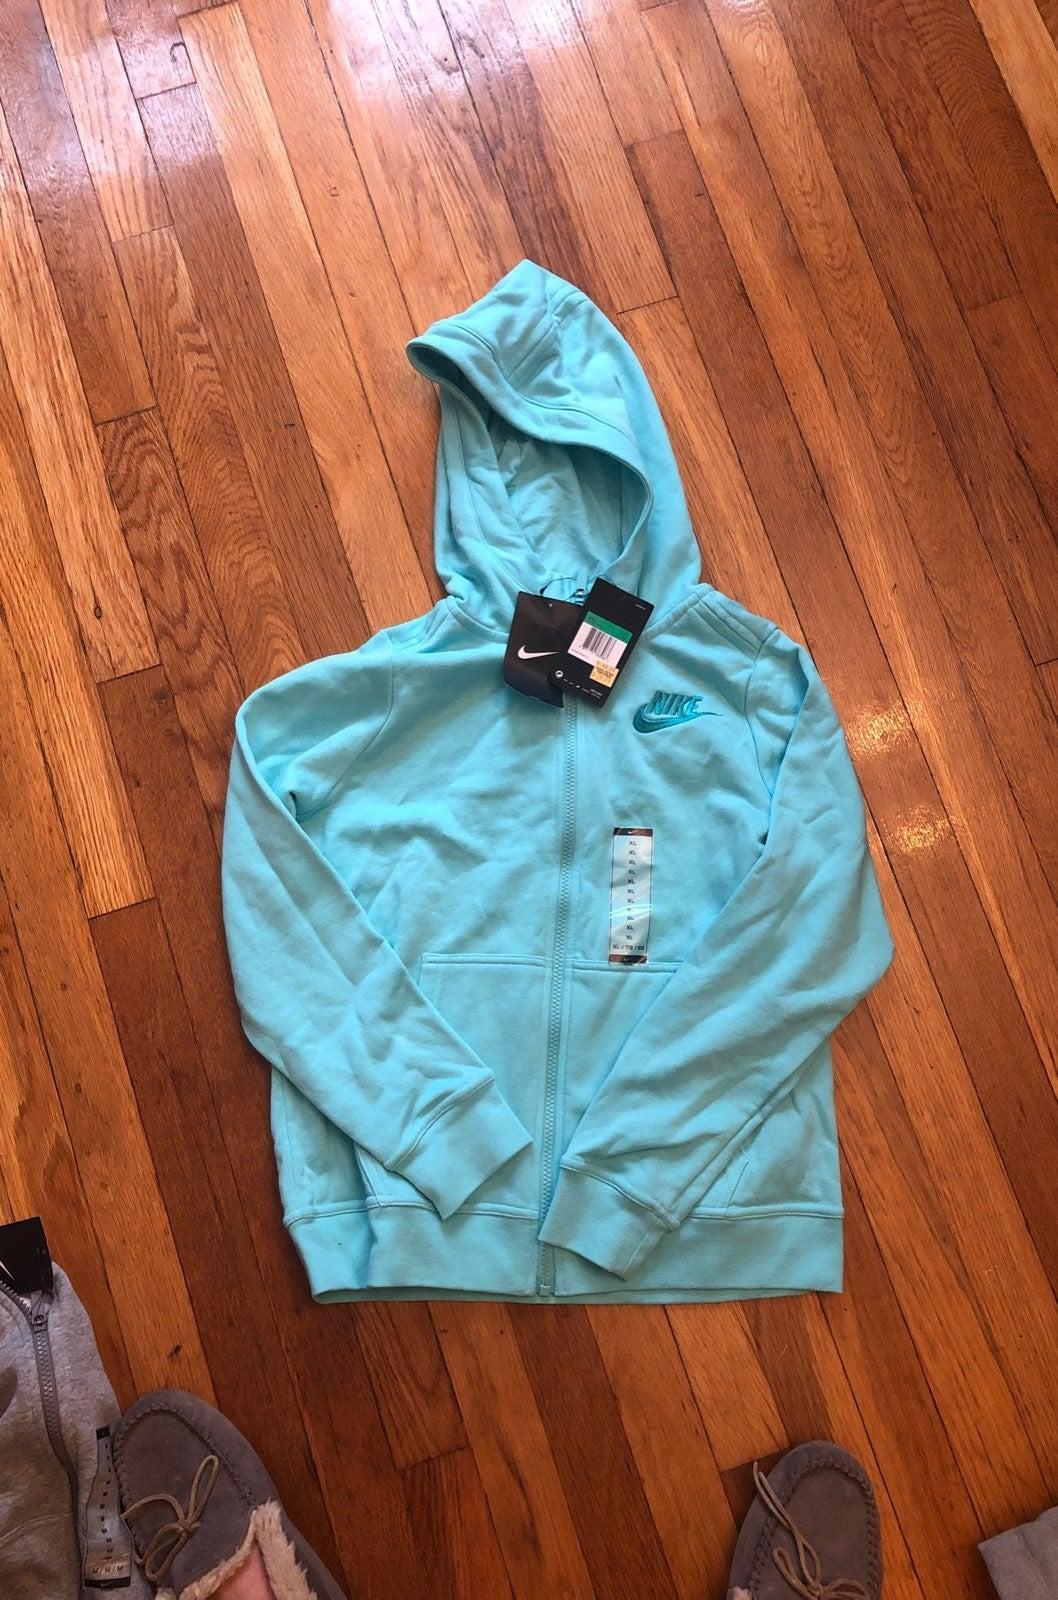 Nike girls hooded sweatshirt, XL